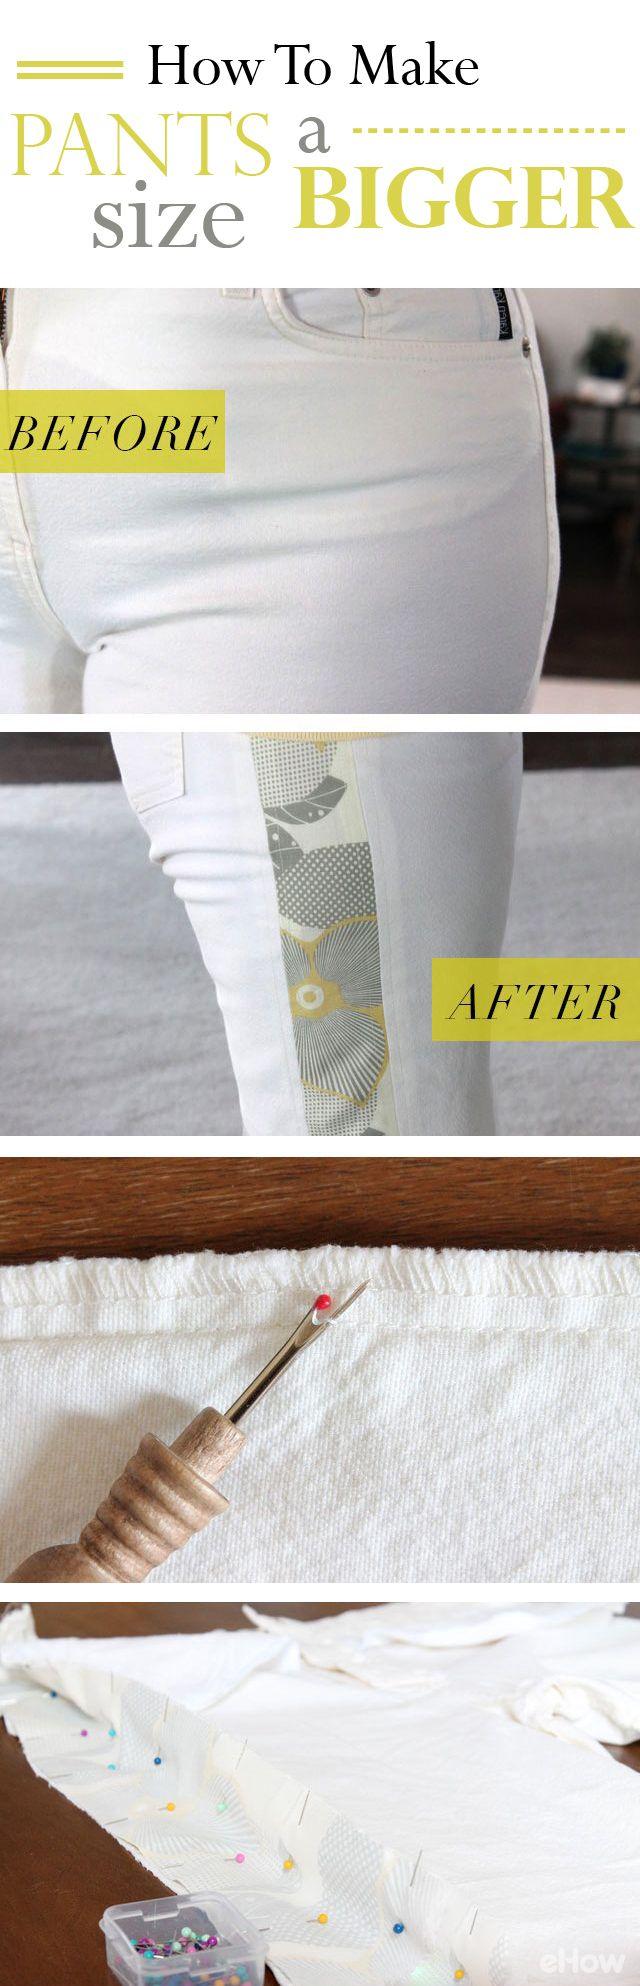 How to Make Pants a Bigger Size | Falda | Pinterest | Costura, Ropa ...